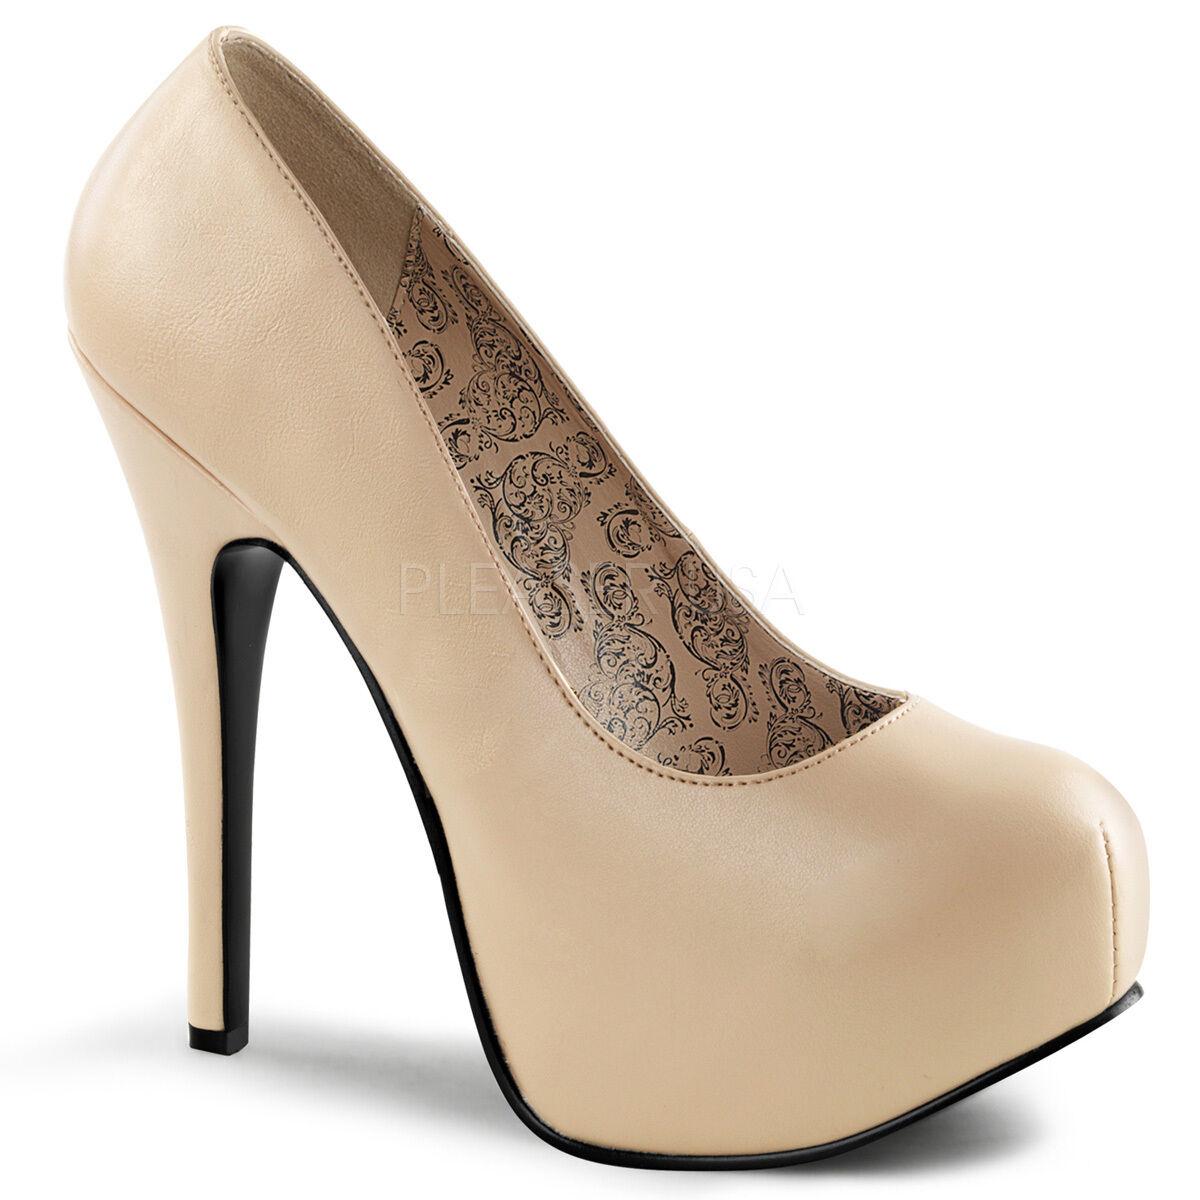 PLEASER Sexy WIDE WIDTH Hidden Schuhes Hidden WIDTH Platform Stiletto Heel Cream Matte Pumps e80cae